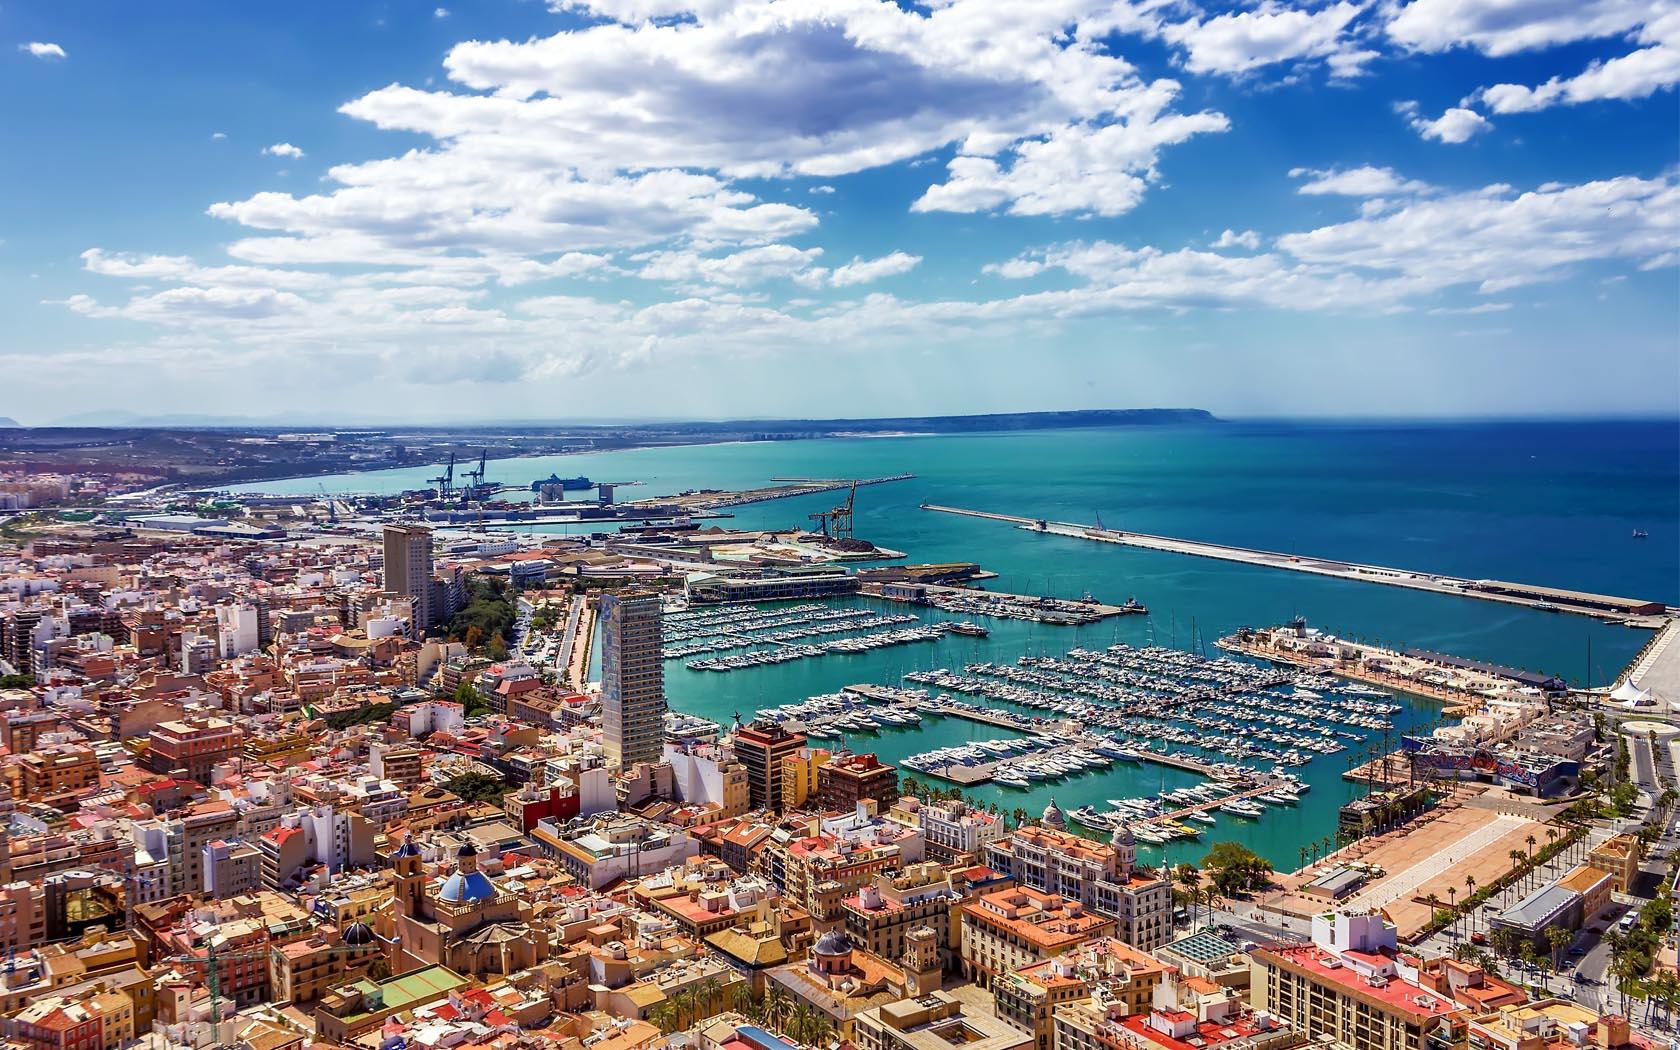 Alicante incentives